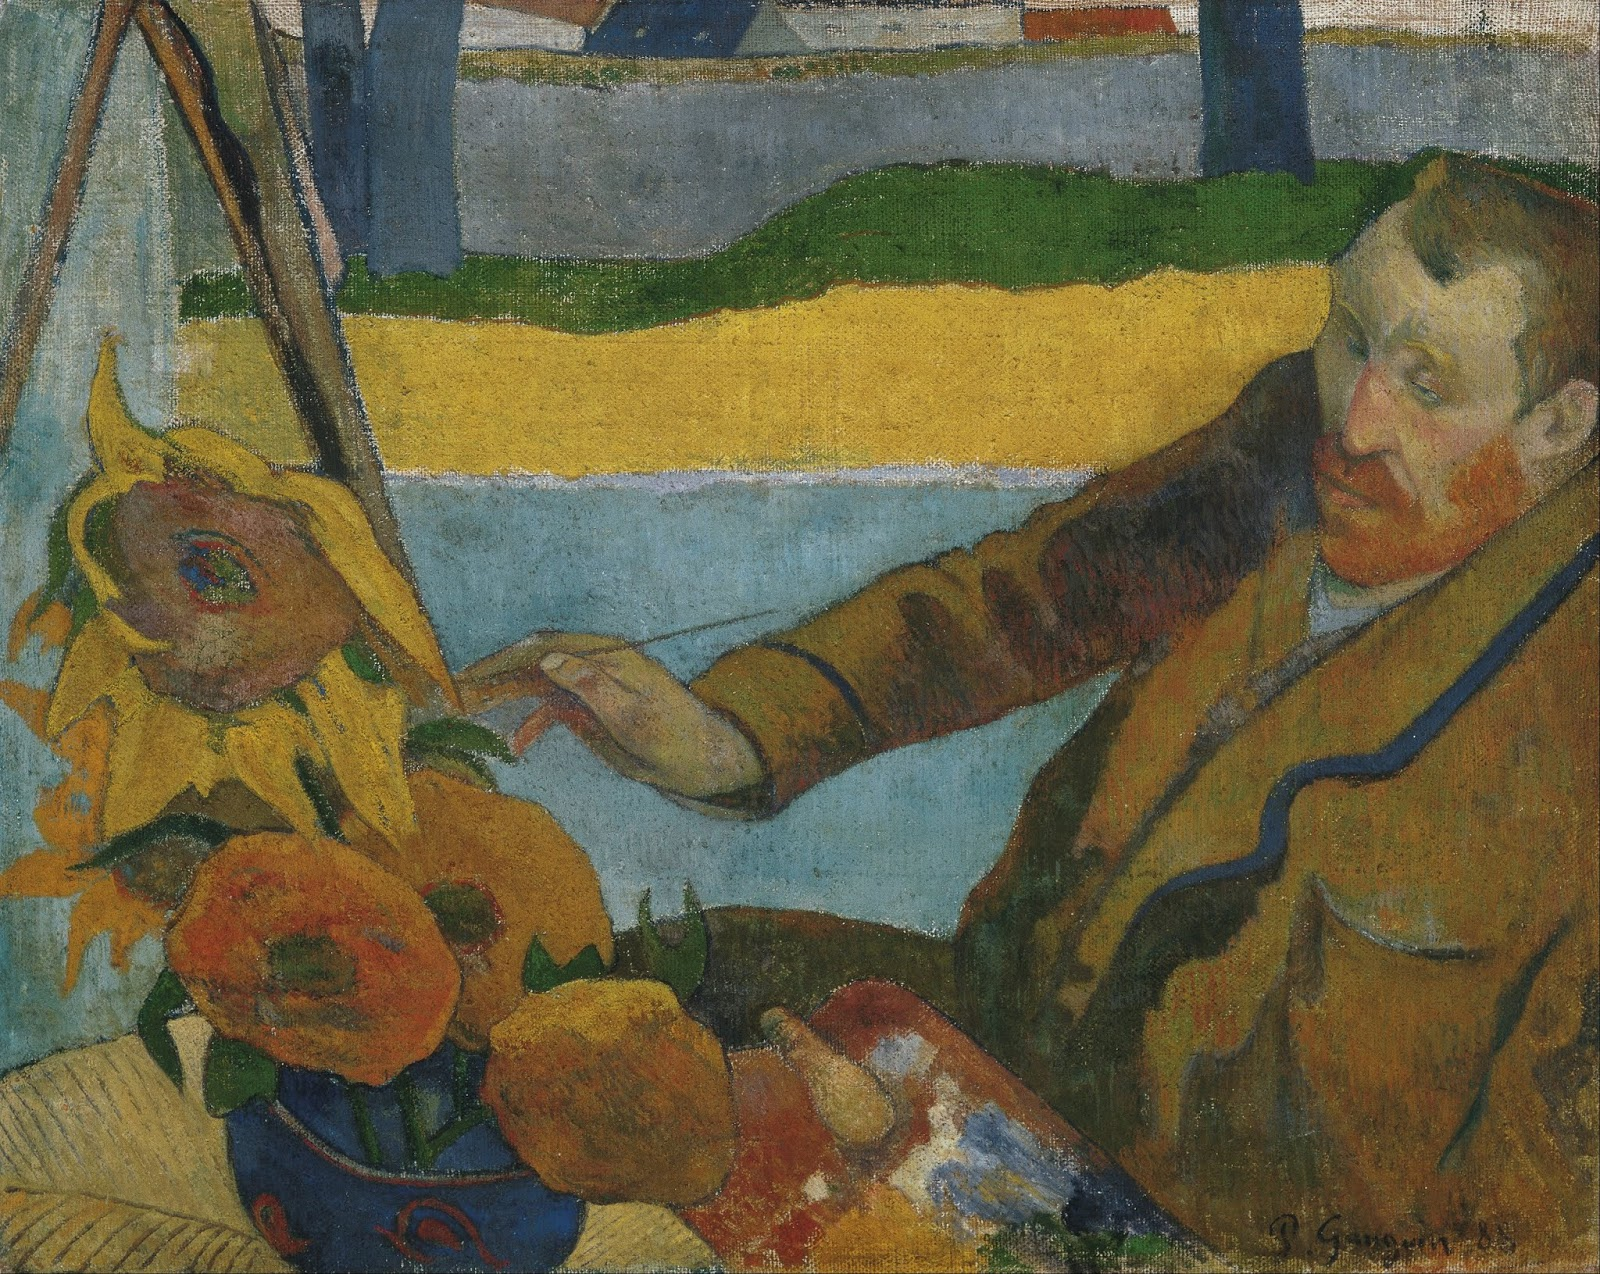 Vincent van Gogh painting sunflowers by Paul Gauguin, 1888